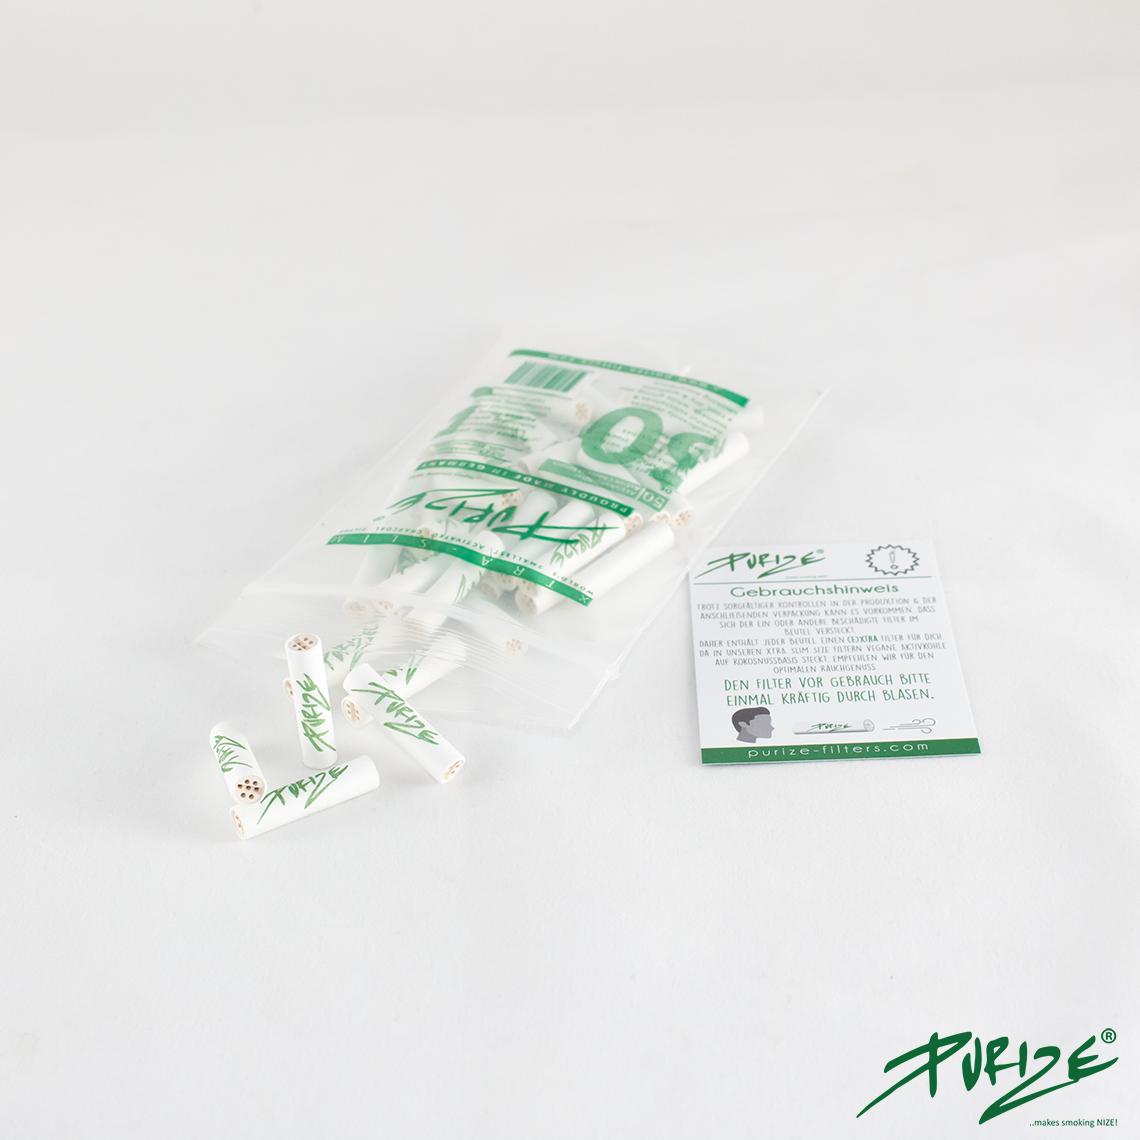 Purize Xtra 100 - Xtra Slim, Aktivkohlefilter